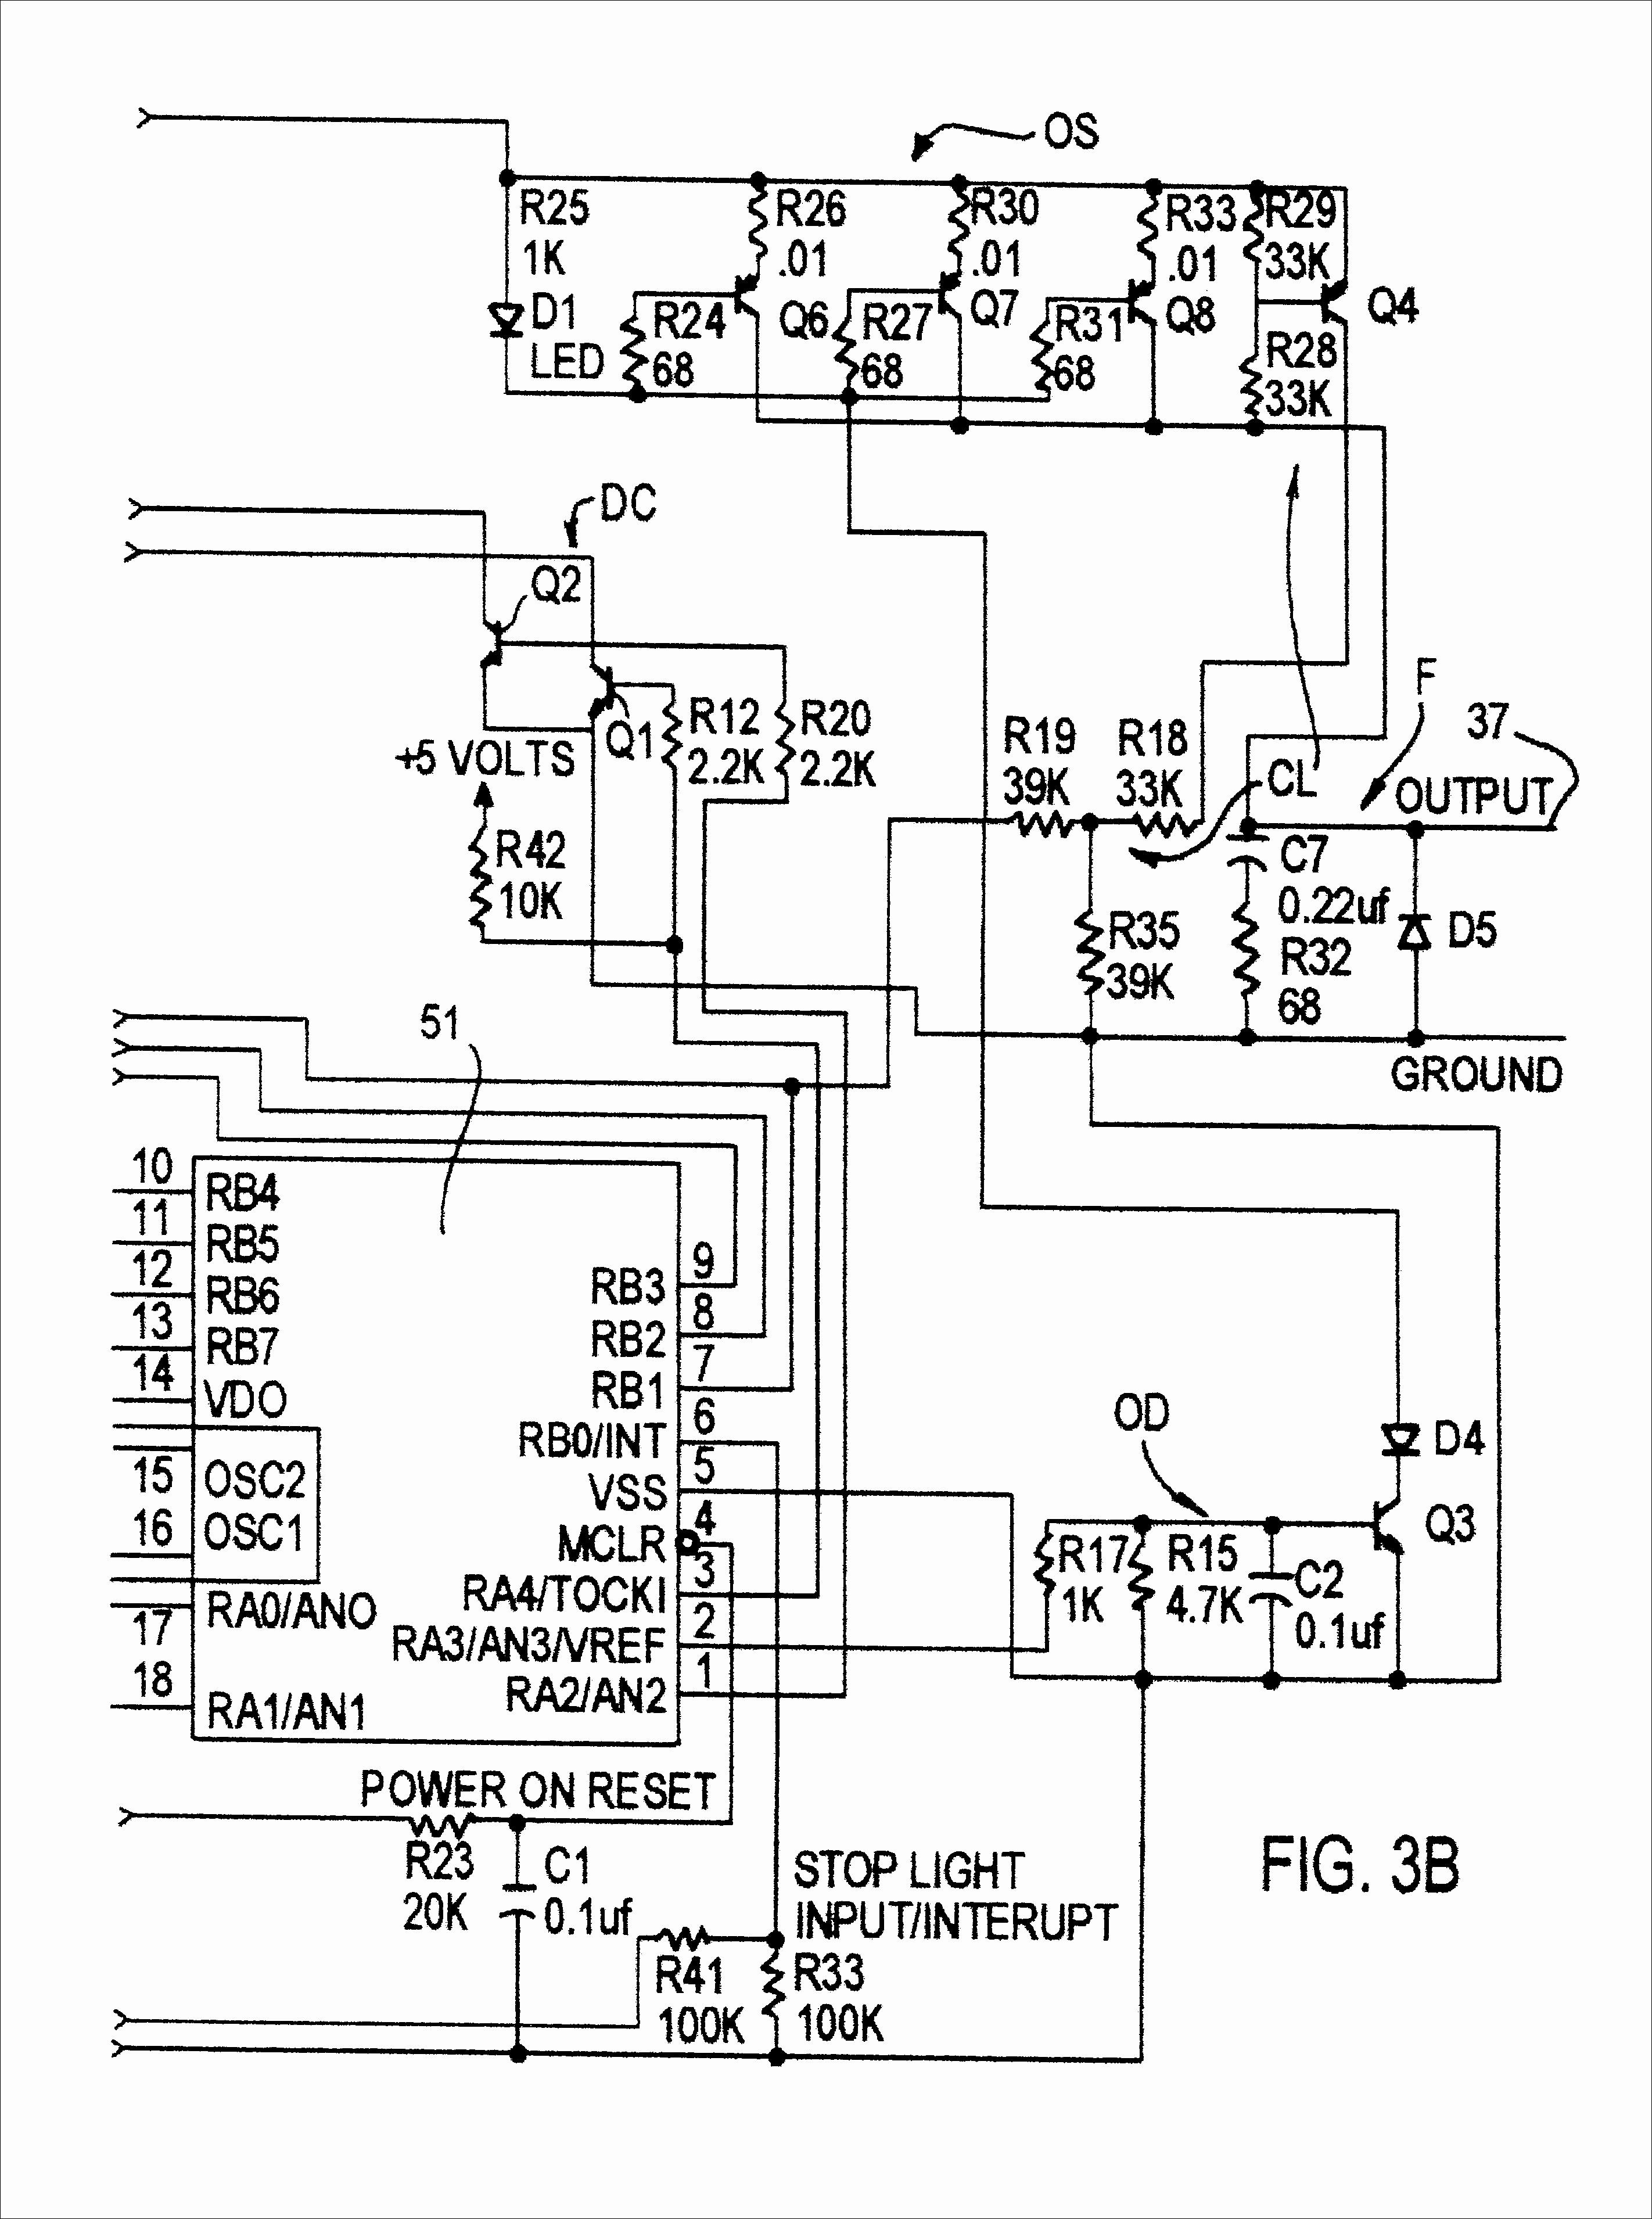 Basic    Motorcycle    Engine    Diagram      My    Wiring       DIagram